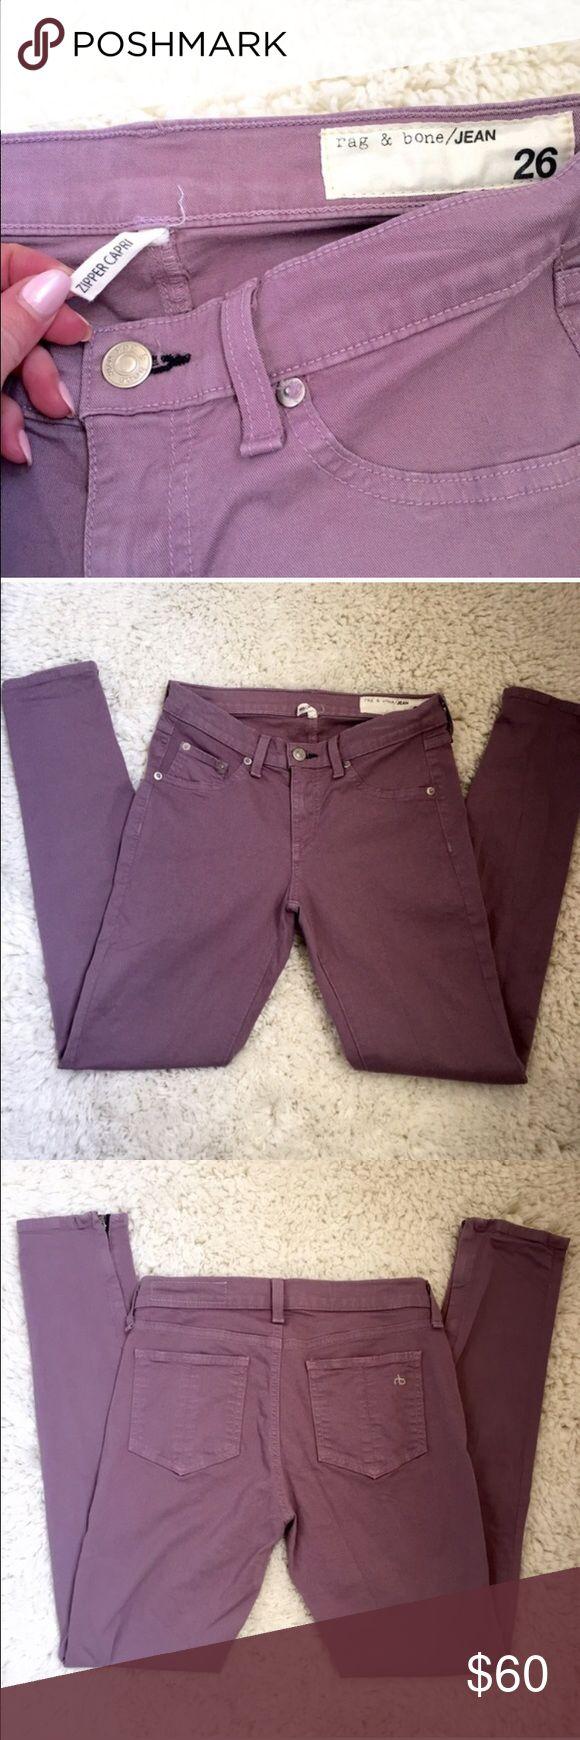 Rag & bone lavender purple jeans 26 Form fitting Capri zipper ankle jeans in lavender rag & bone Jeans Skinny